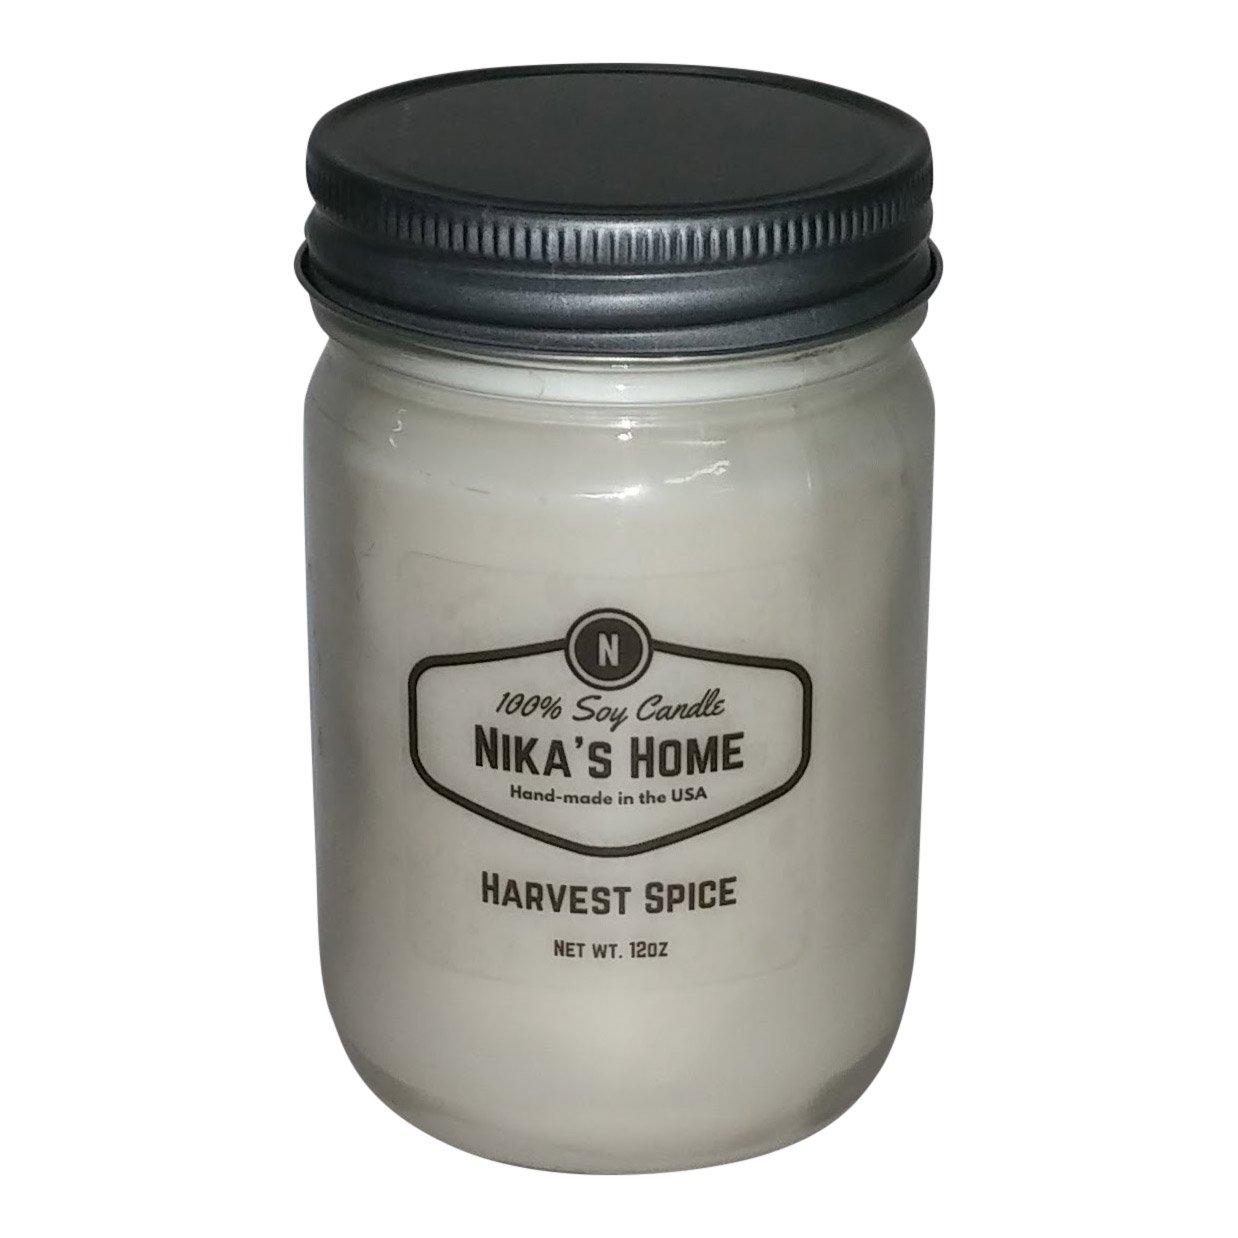 Nika's Home Harvest Spice Soy Candle - 12oz Mason Jar